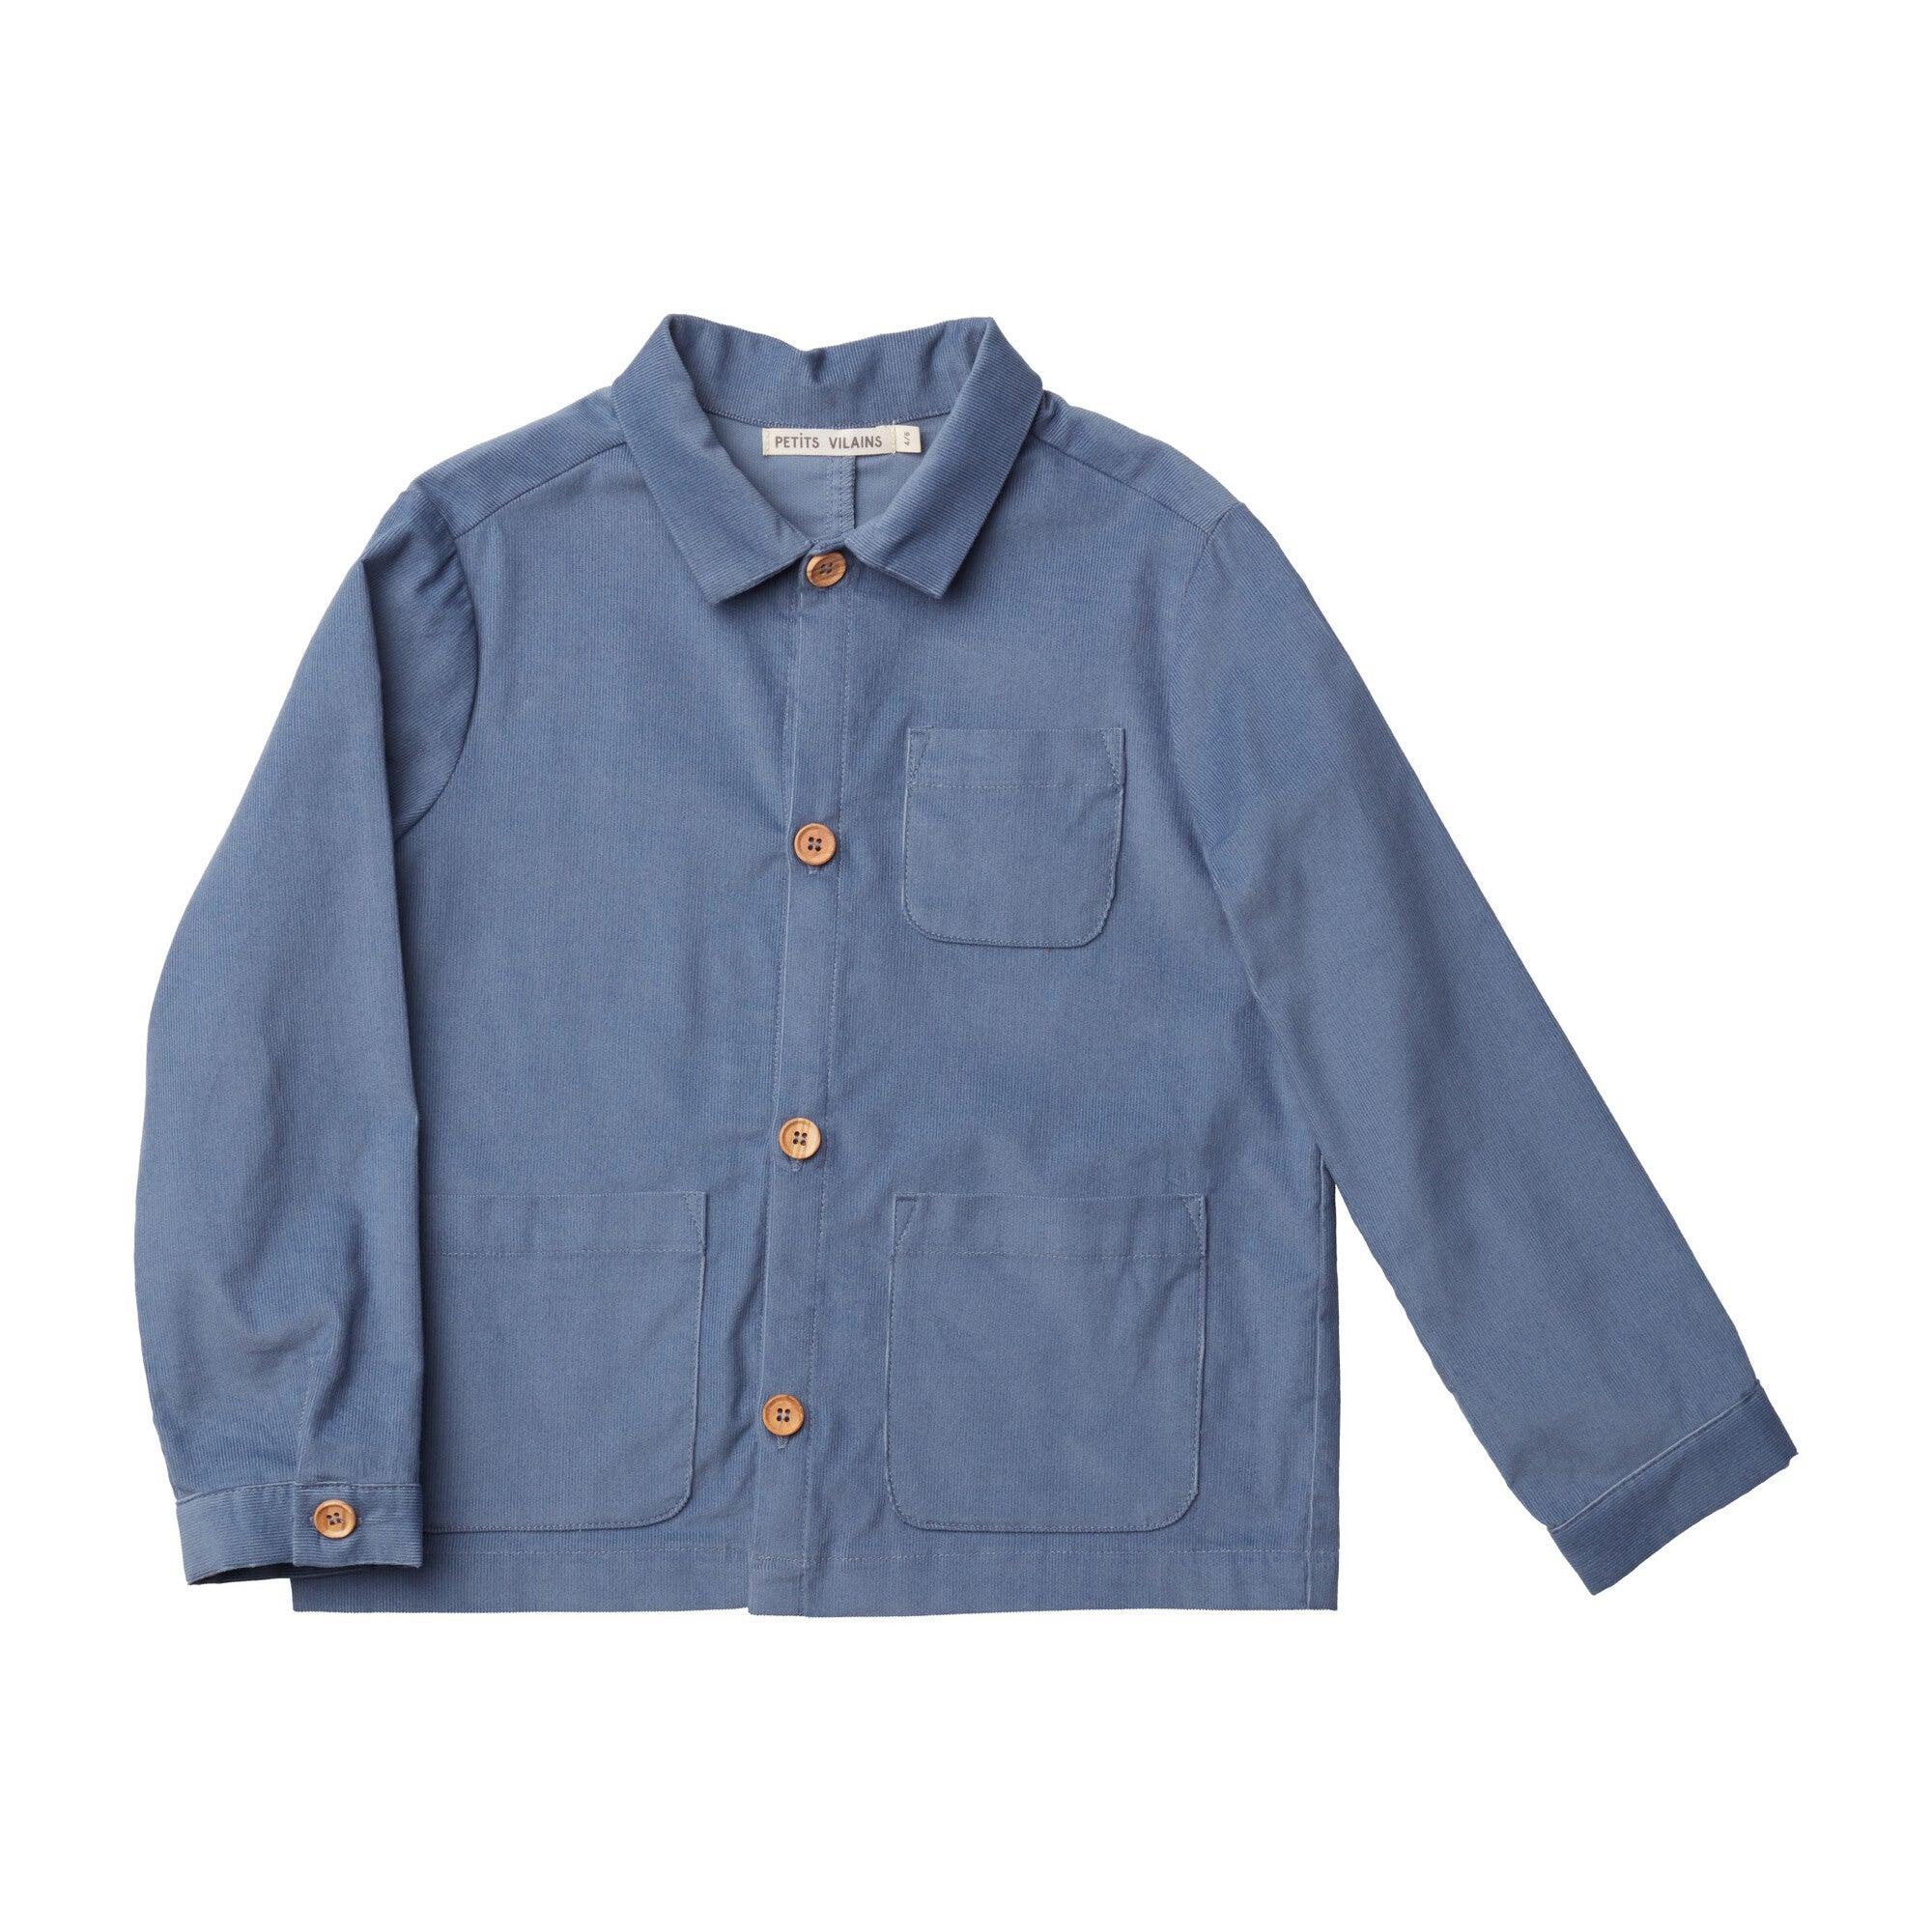 Oscar Chore Shirt, Blue